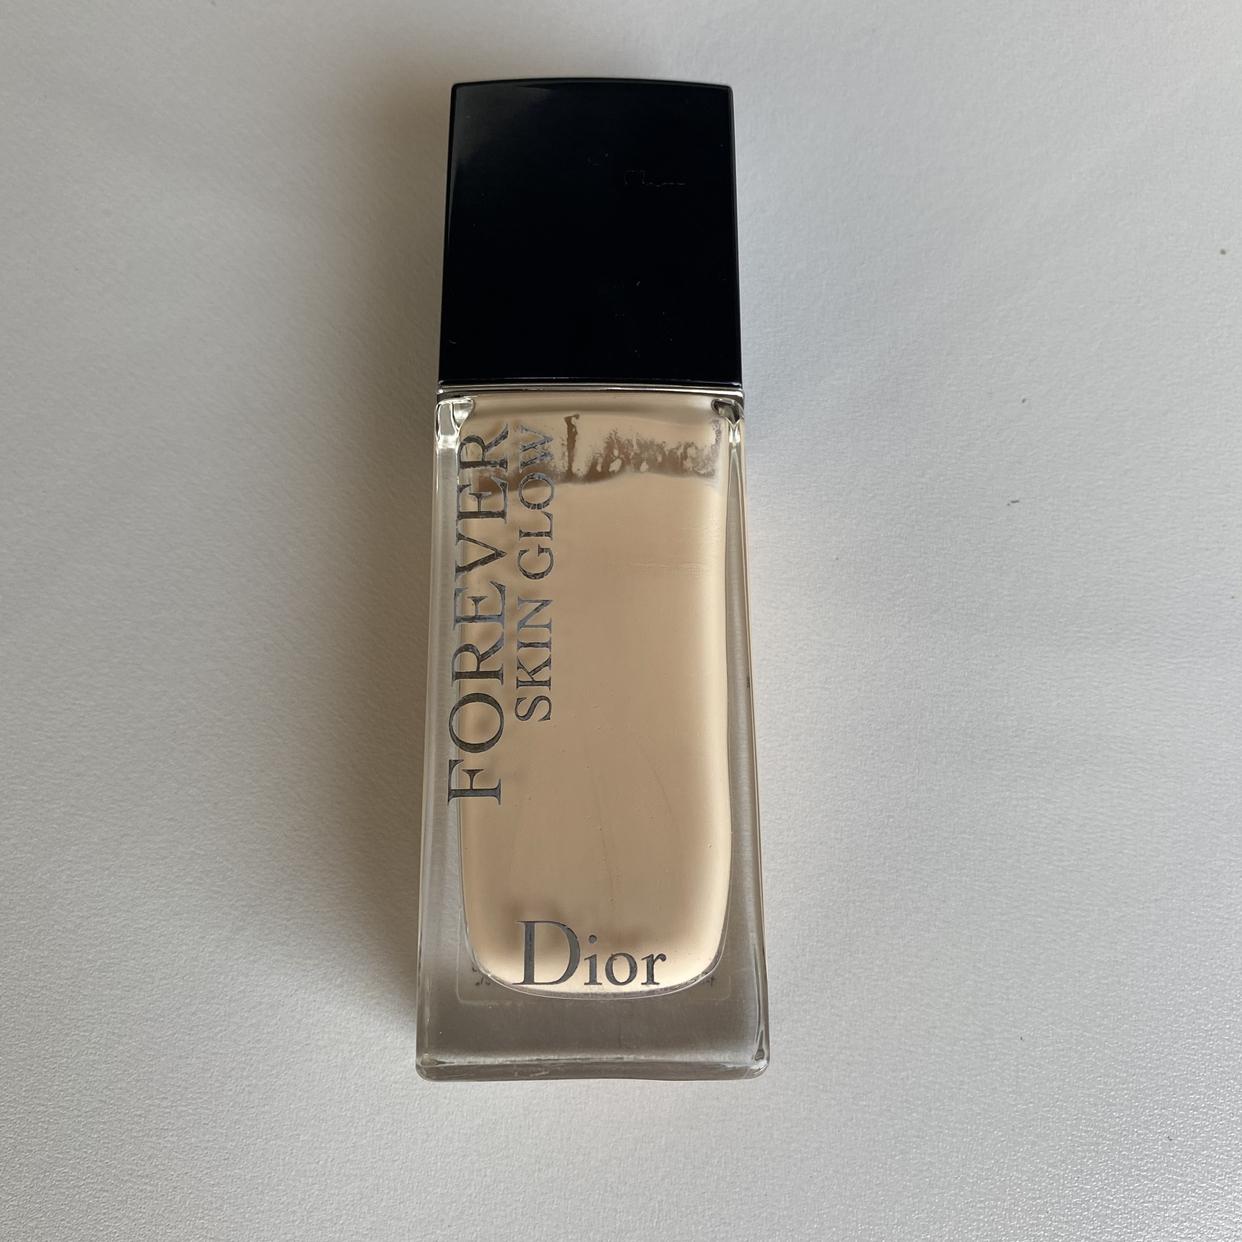 Dior(ディオール)スキン フォーエヴァー フルイド グロウを使ったLilyさんのクチコミ画像1